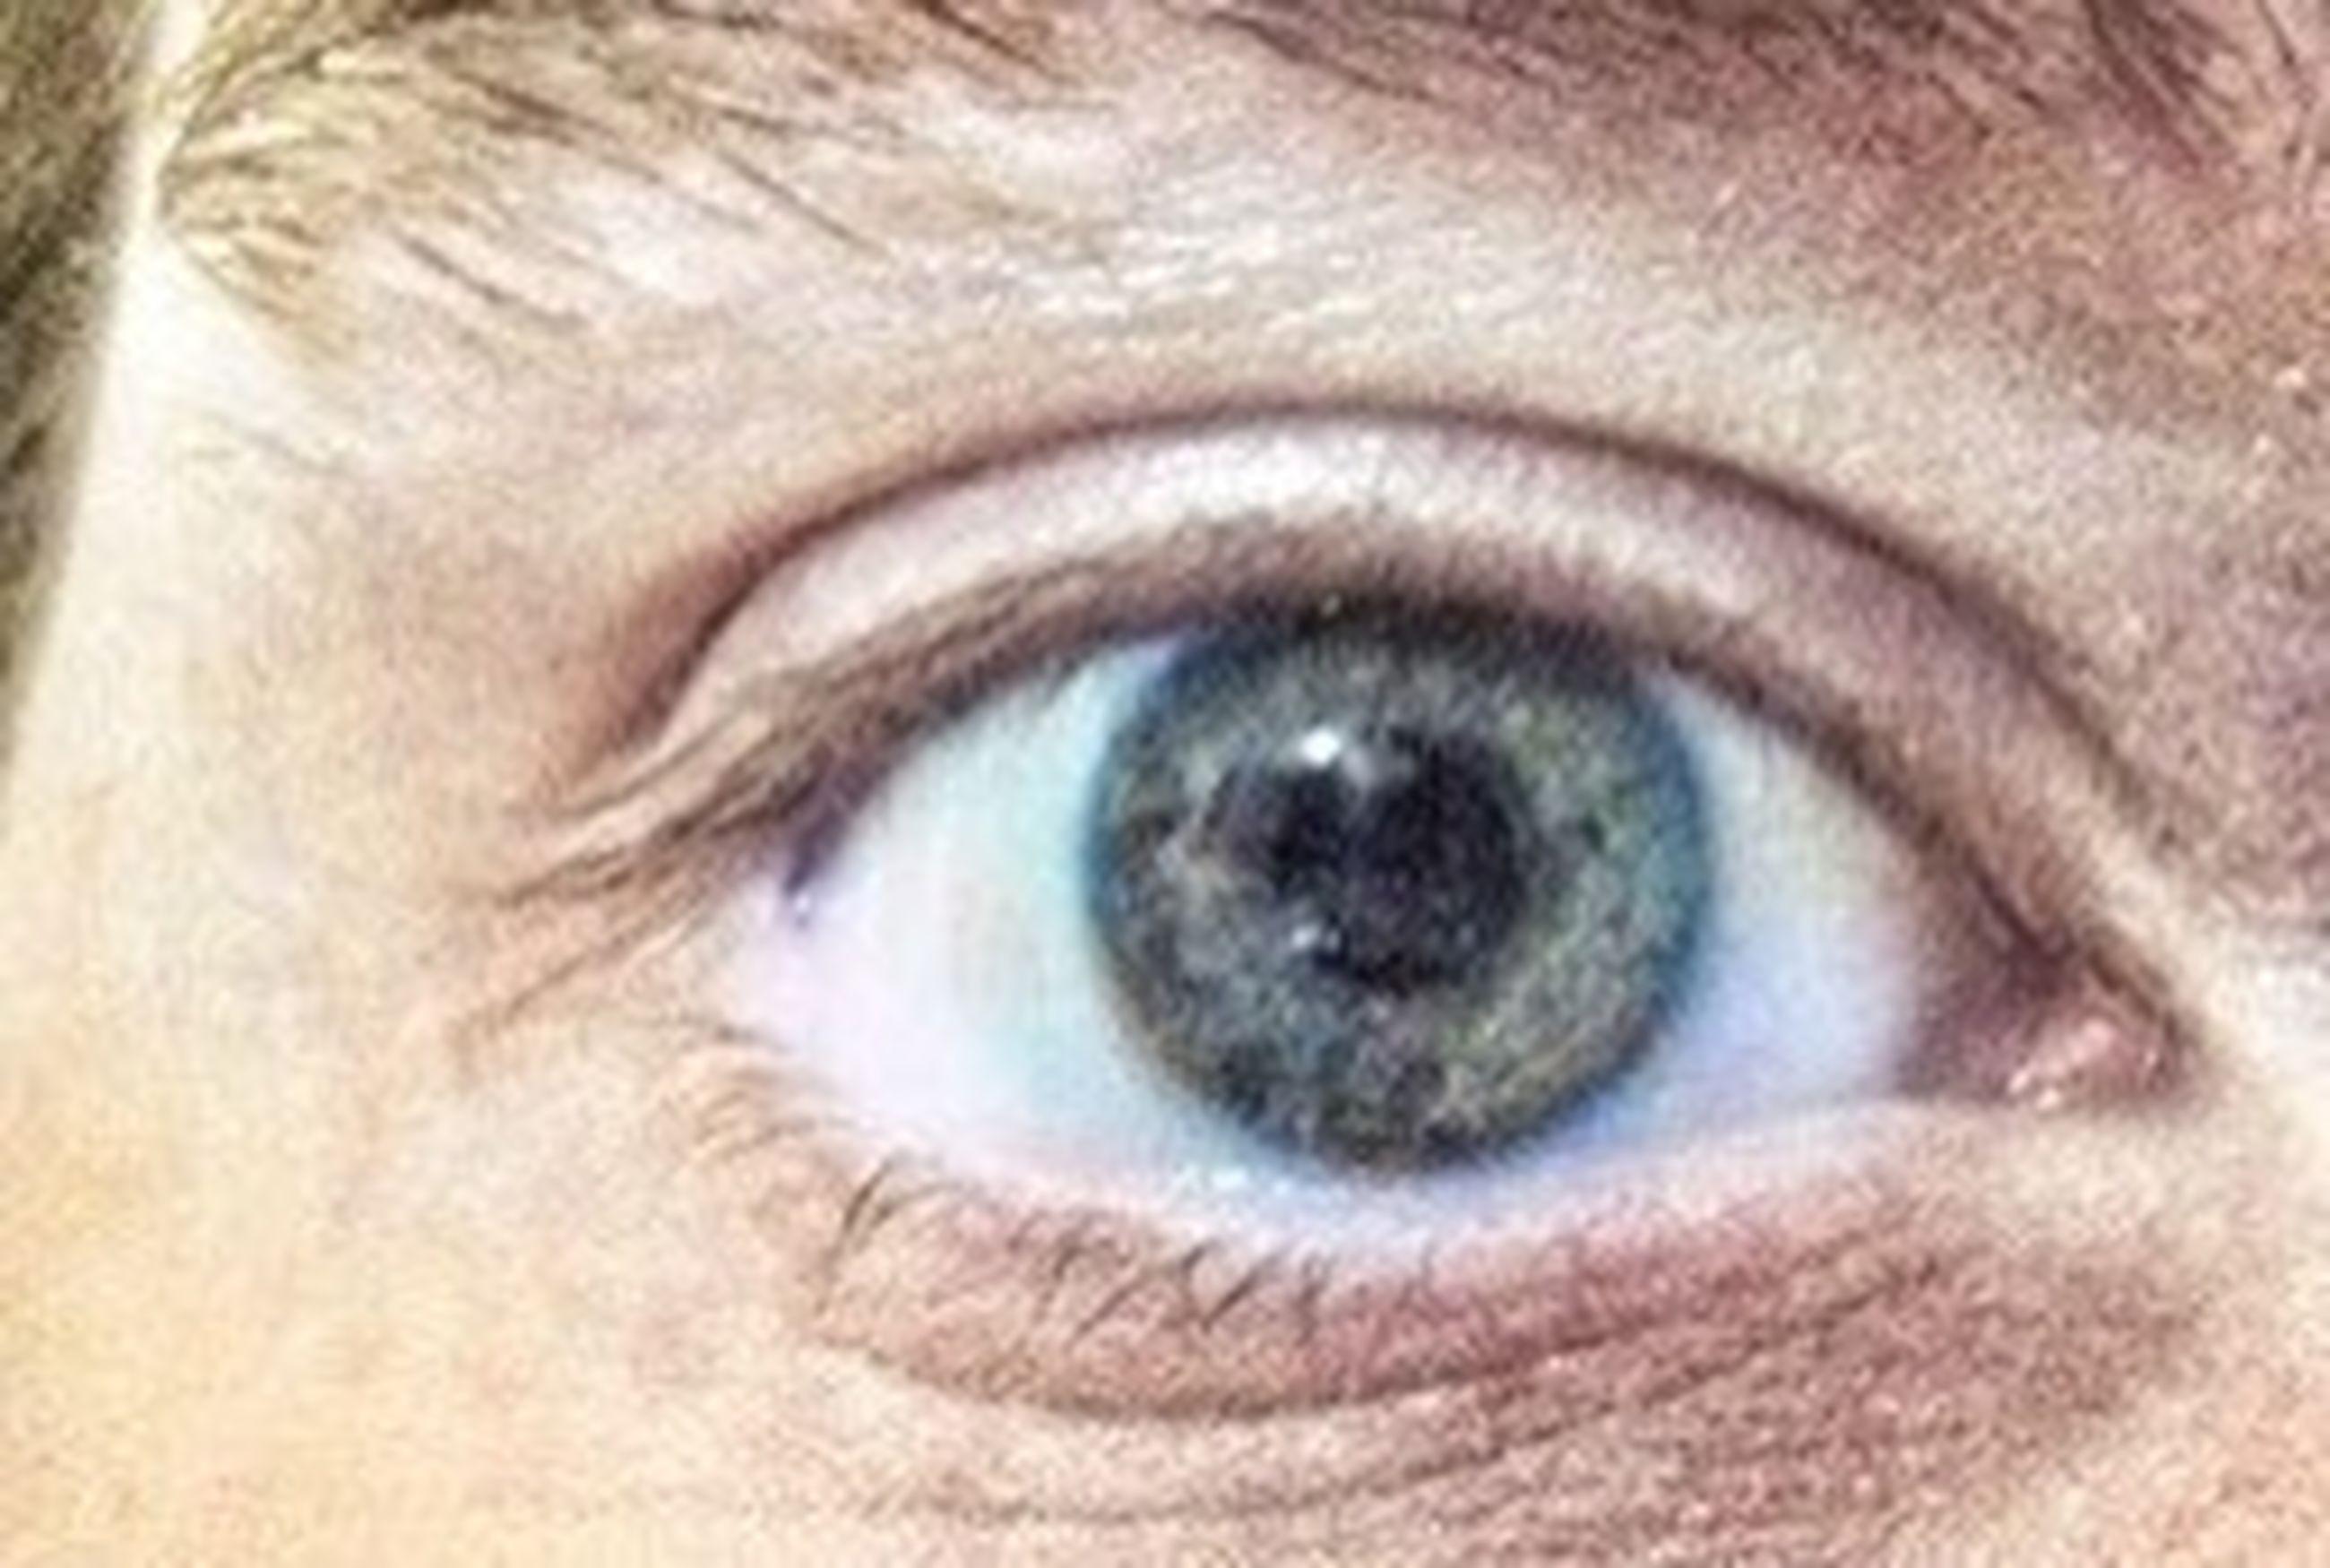 human eye, eyelash, close-up, eyesight, sensory perception, extreme close-up, part of, extreme close up, looking at camera, eyeball, portrait, indoors, iris - eye, human skin, full frame, pets, one animal